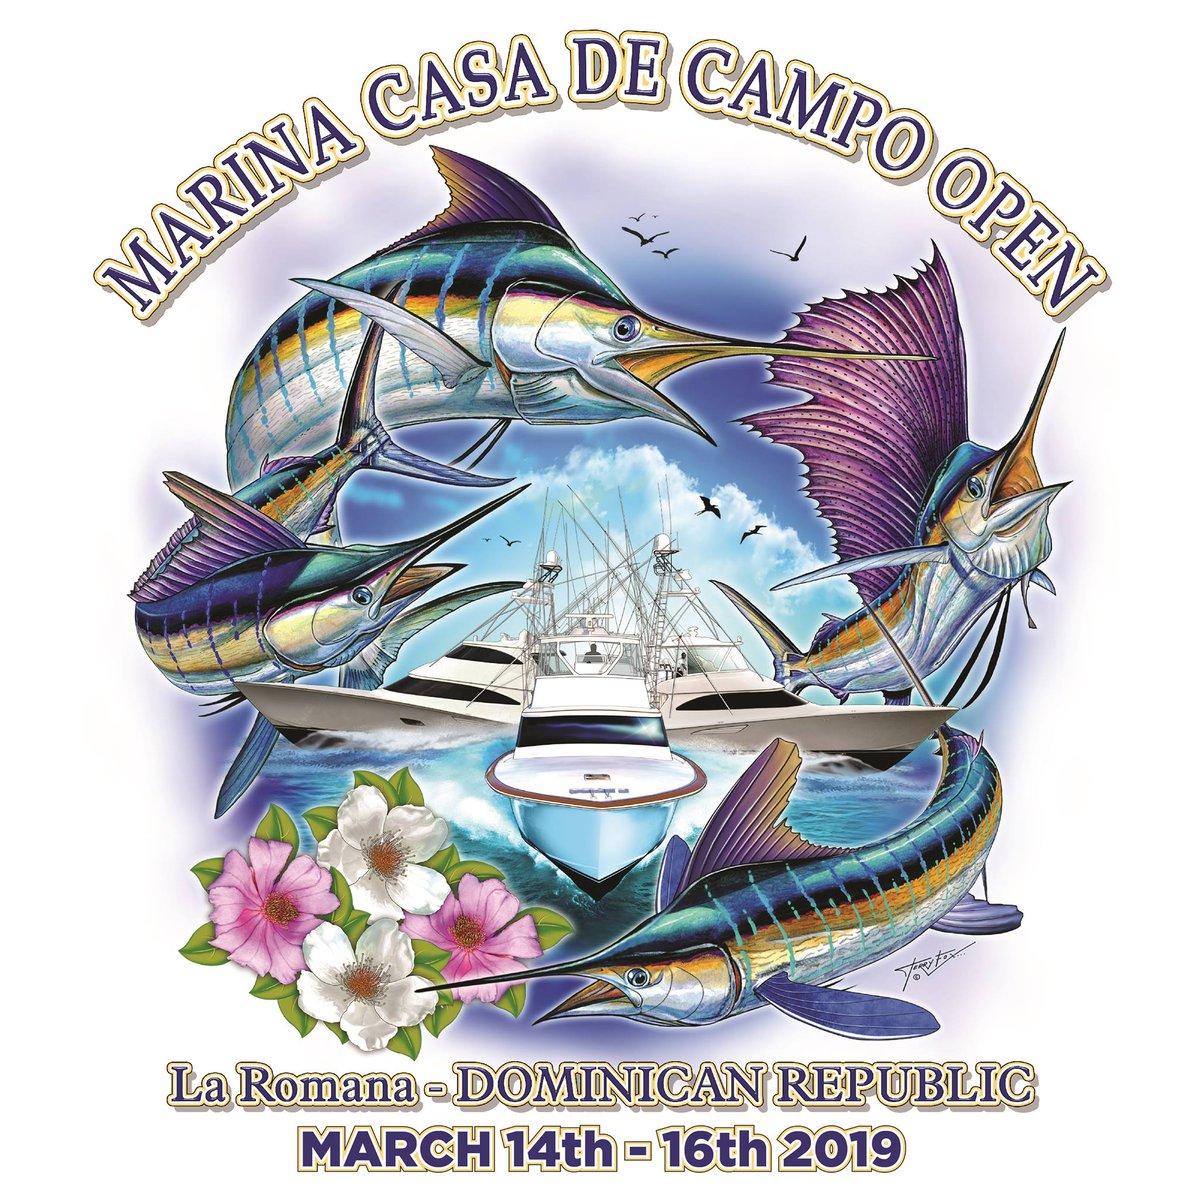 Marina Casa de Campo Open - March 14-16, 2019 https://t.co/bUiWWzg9P2